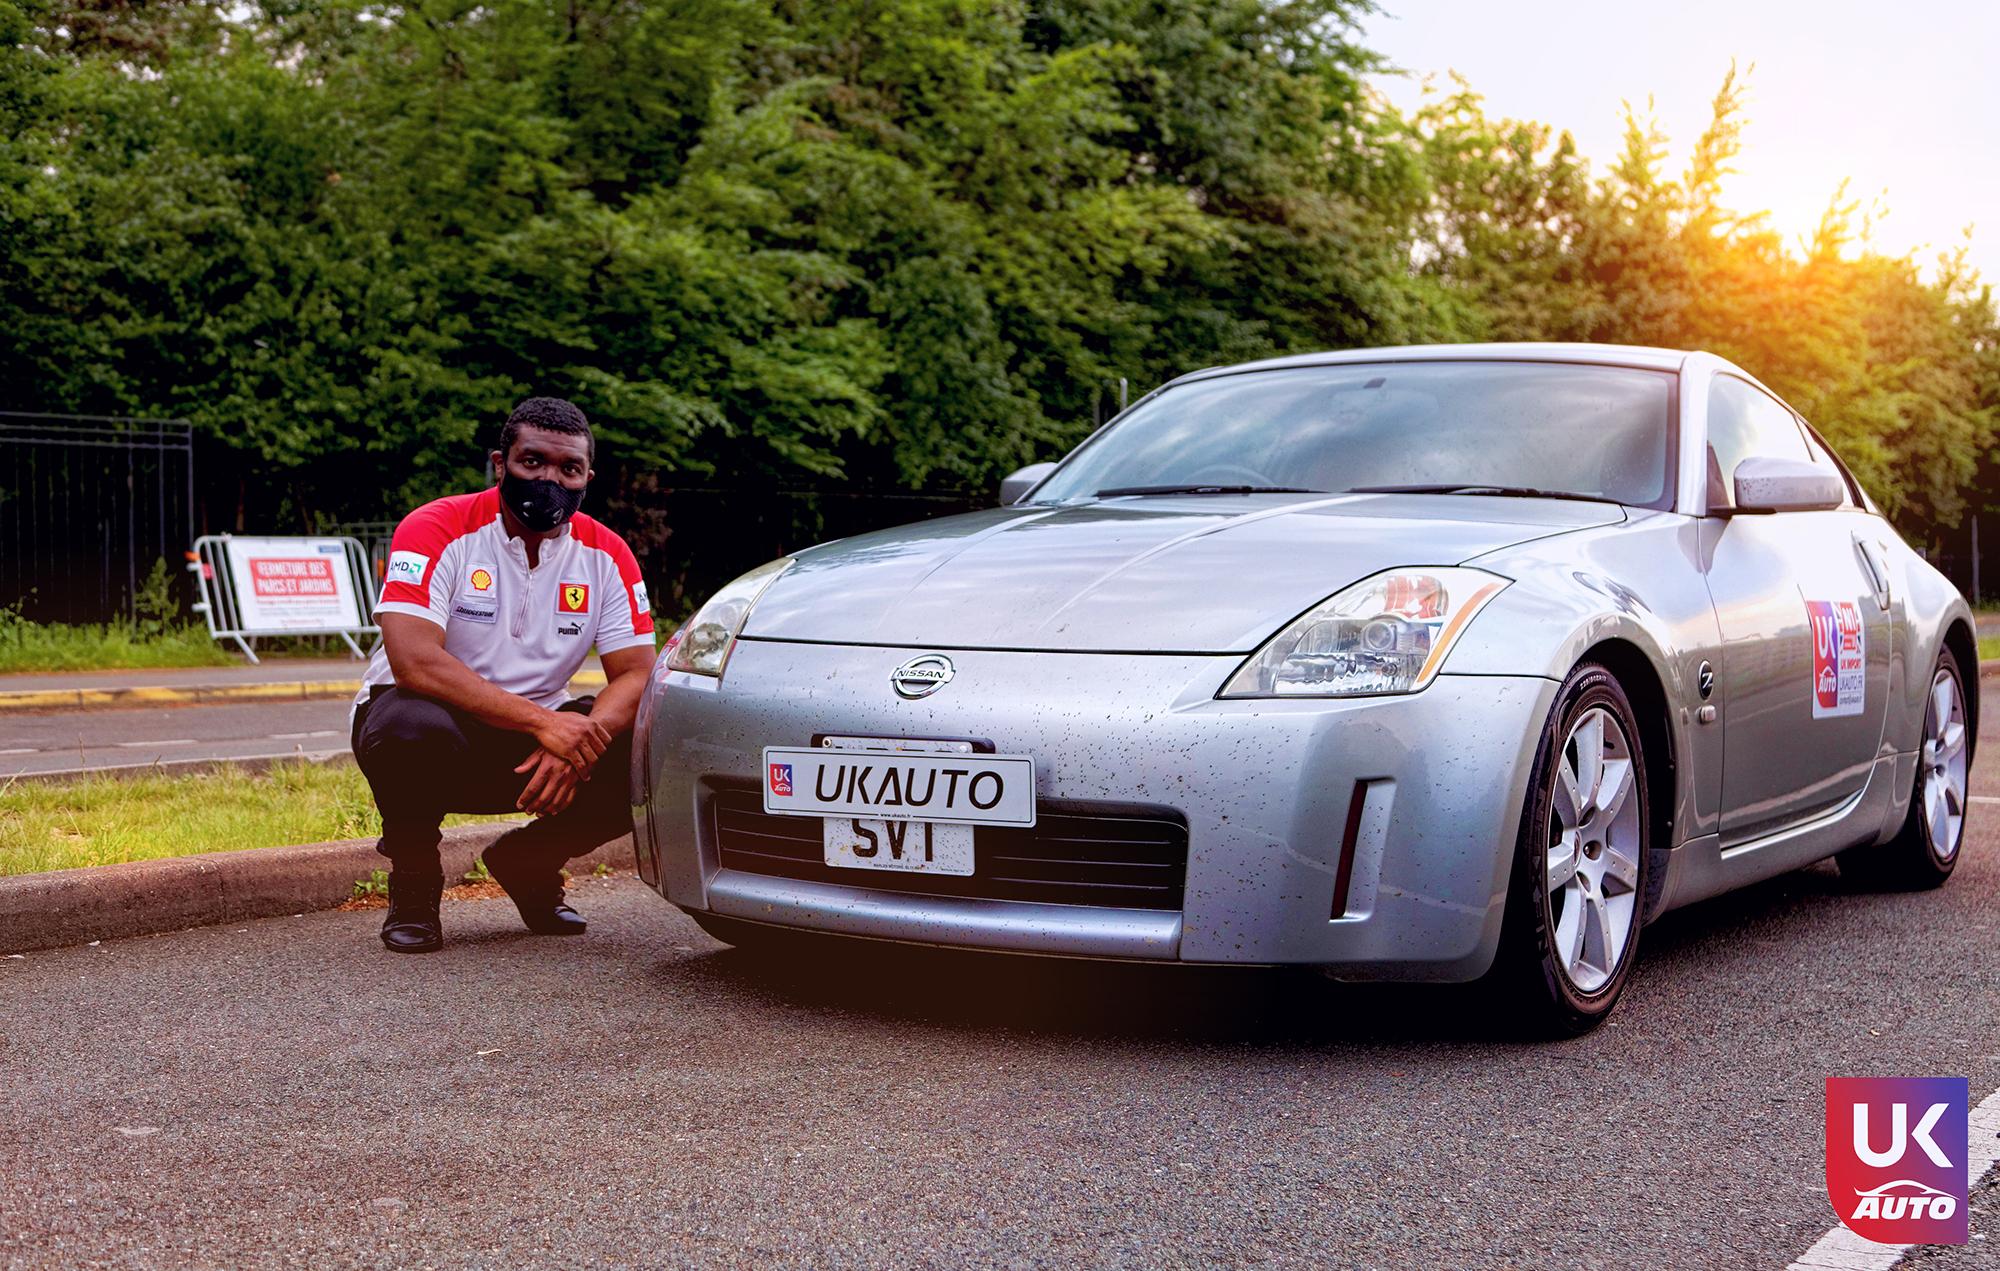 Ukauto import nissan 350z jdm import fairlady v6 import uk ukauto rhd nissan import uk13 - Import Nissan 350Z JDM IMPORT 3.5 V6 TIPTRONIC IMPORT AUTO par UKAUTO